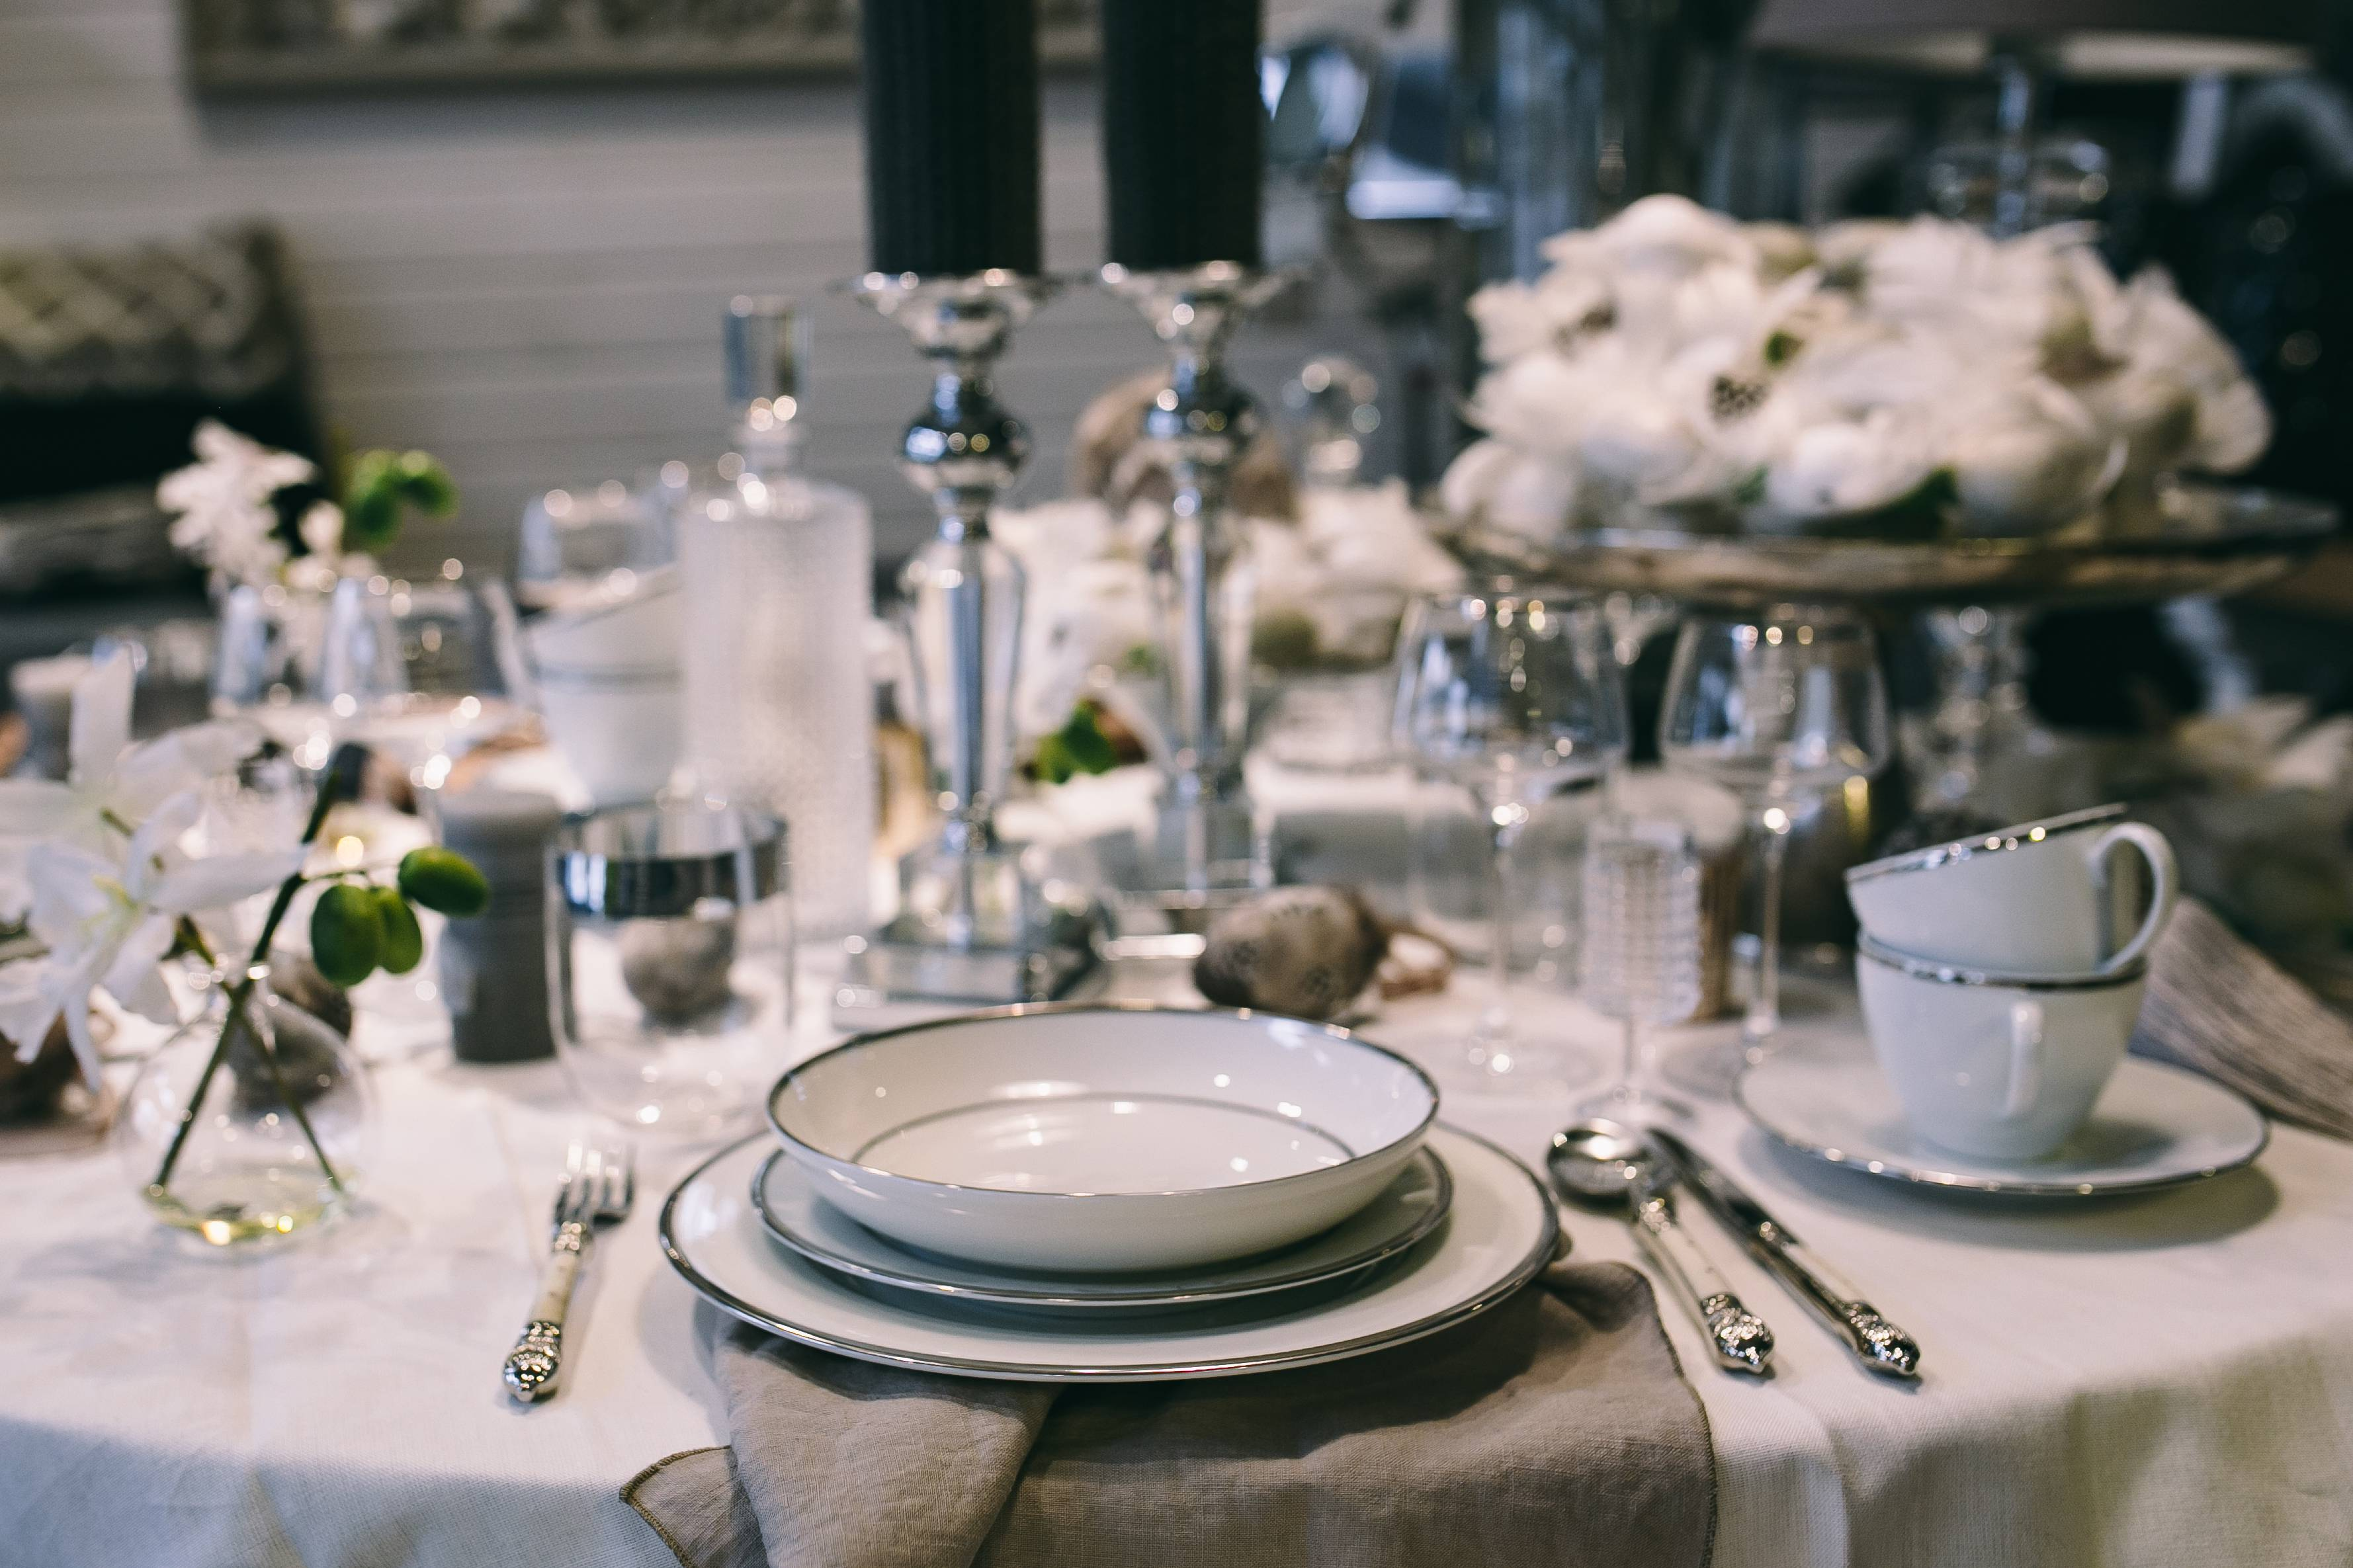 Free Stock Photos Of Lifestyle Home Decor Kaboompics - Fancy restaurant table